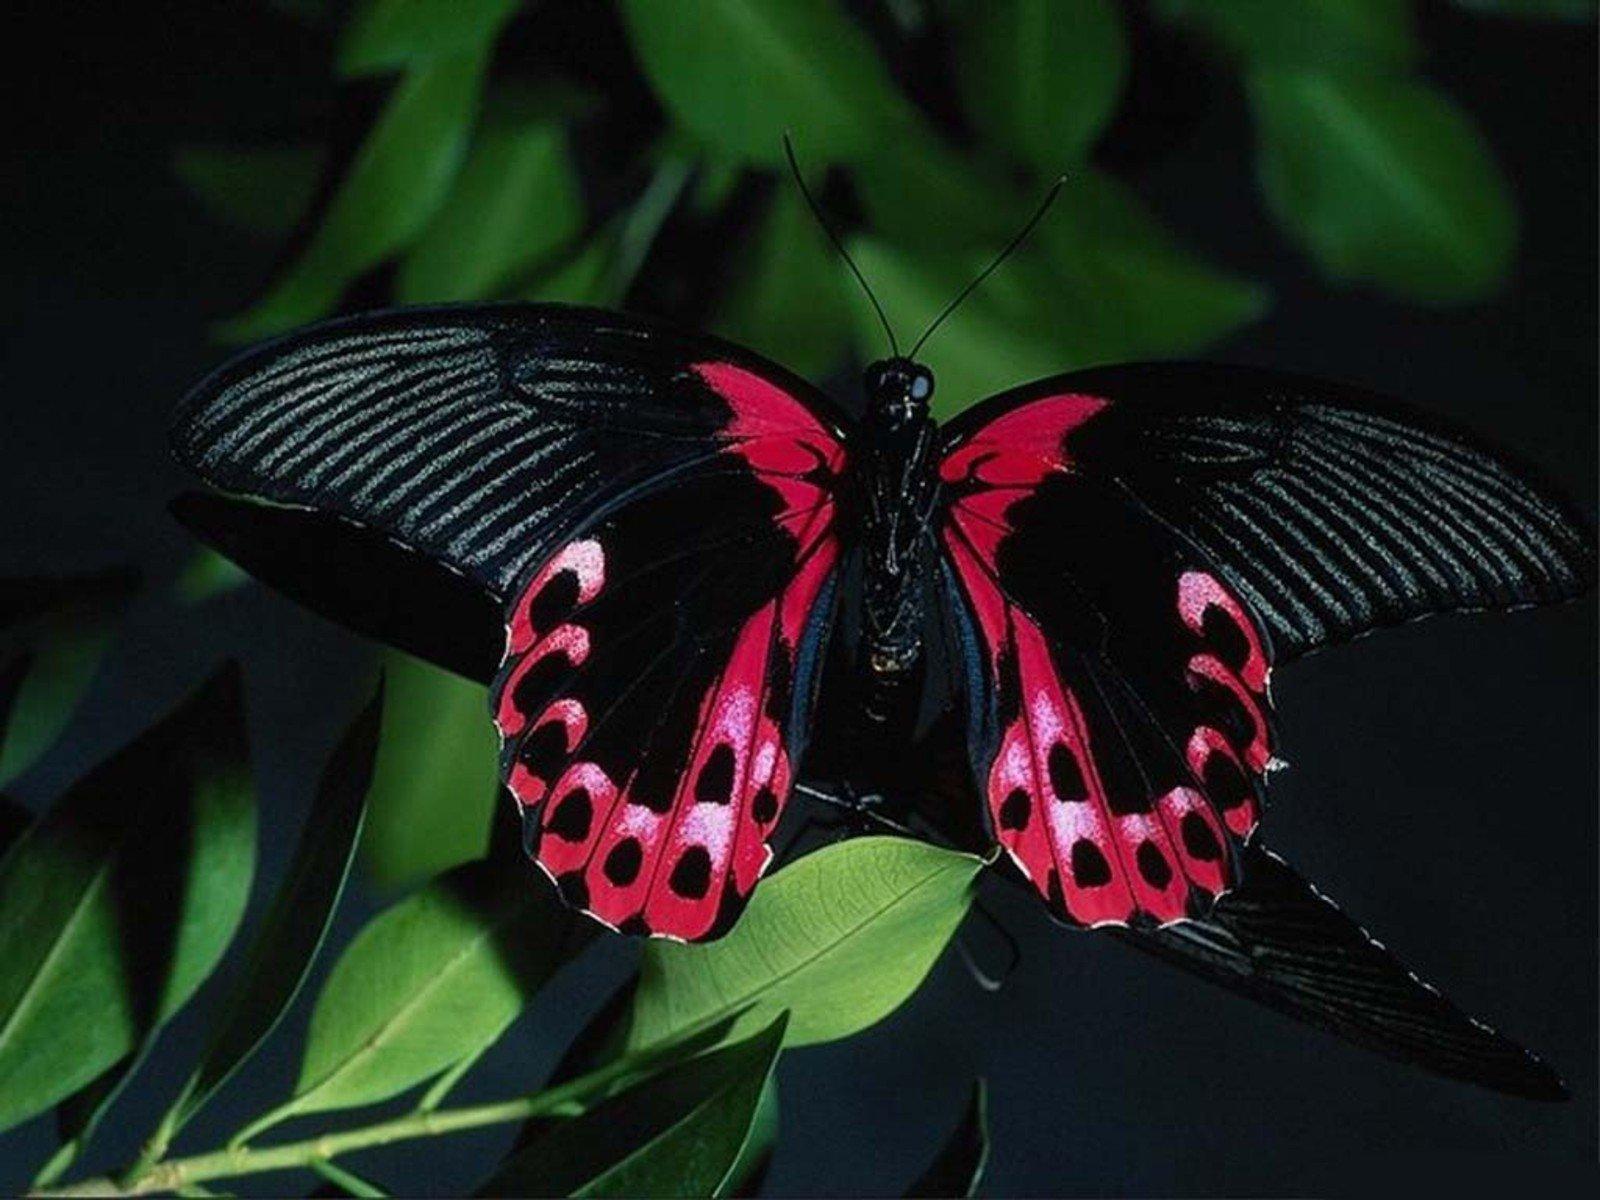 Download 600+ Wallpaper Black Butterfly  Paling Baru